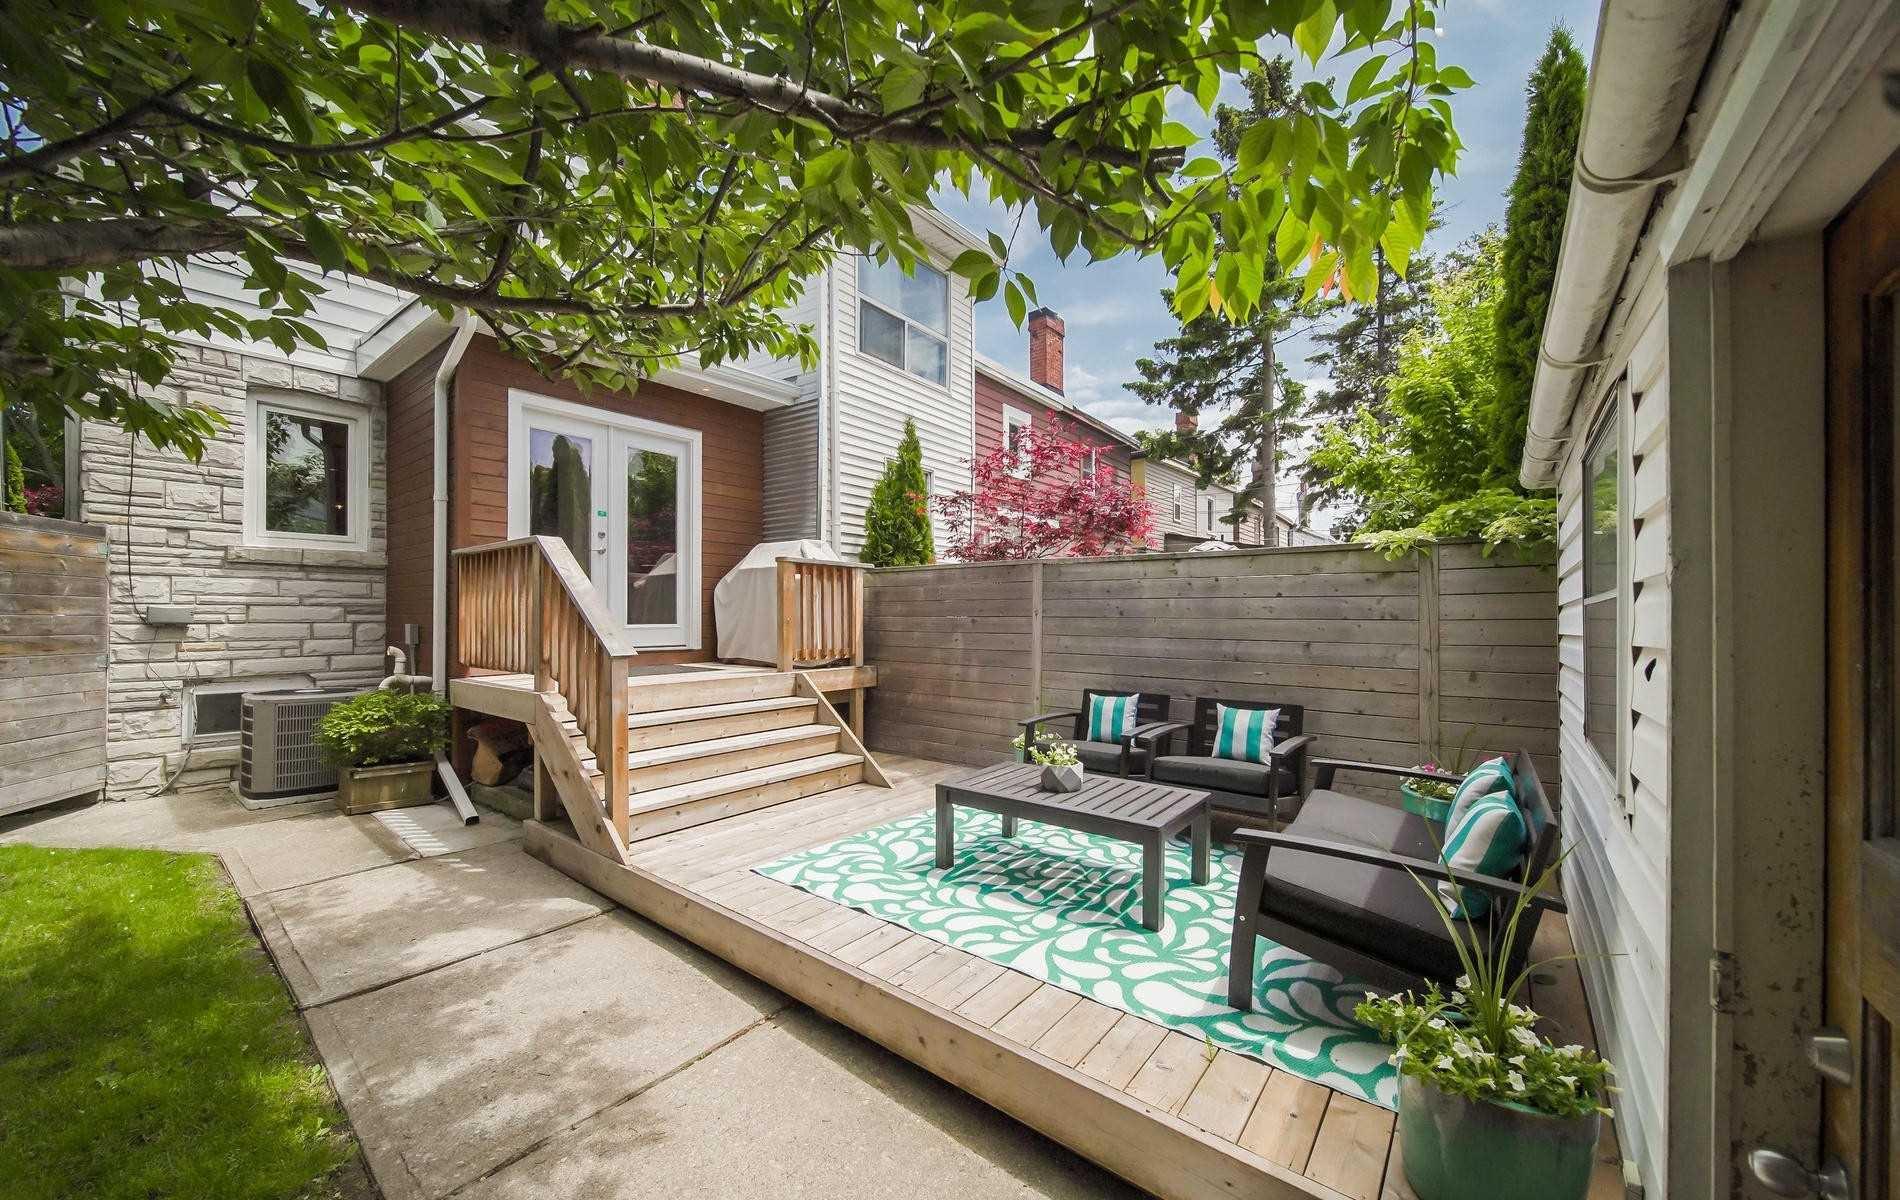 Photo 20: Photos: 64 Larchmount Avenue in Toronto: South Riverdale House (2-Storey) for sale (Toronto E01)  : MLS®# E4489752